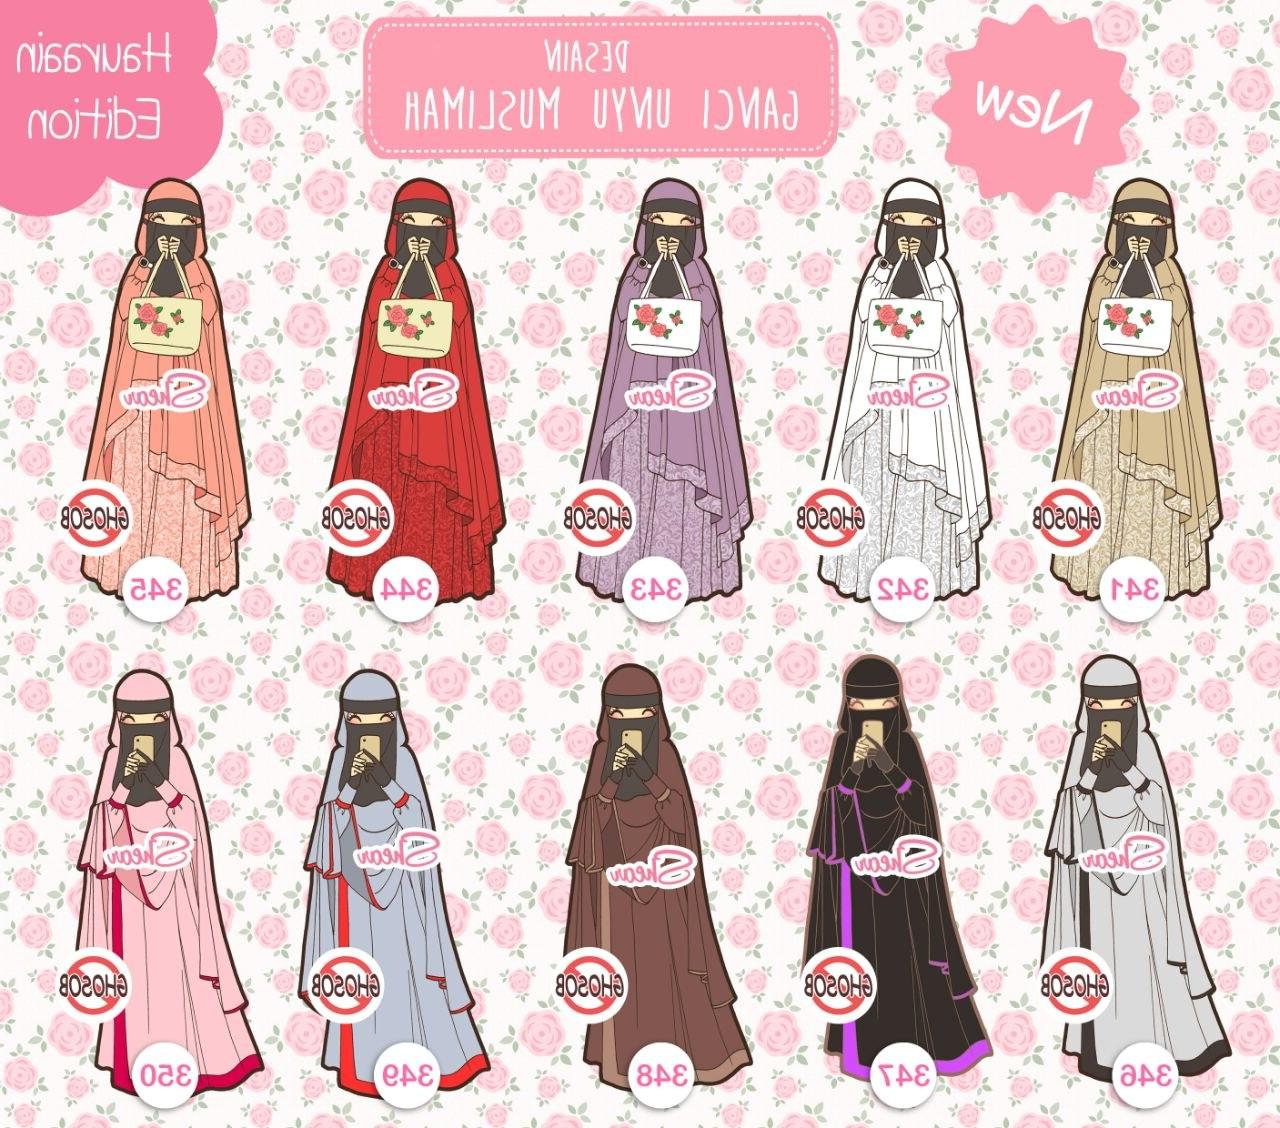 Design Muslimah Bercadar Memanah 3id6 Gambar Kartun Muslimah Bercadar Memanah